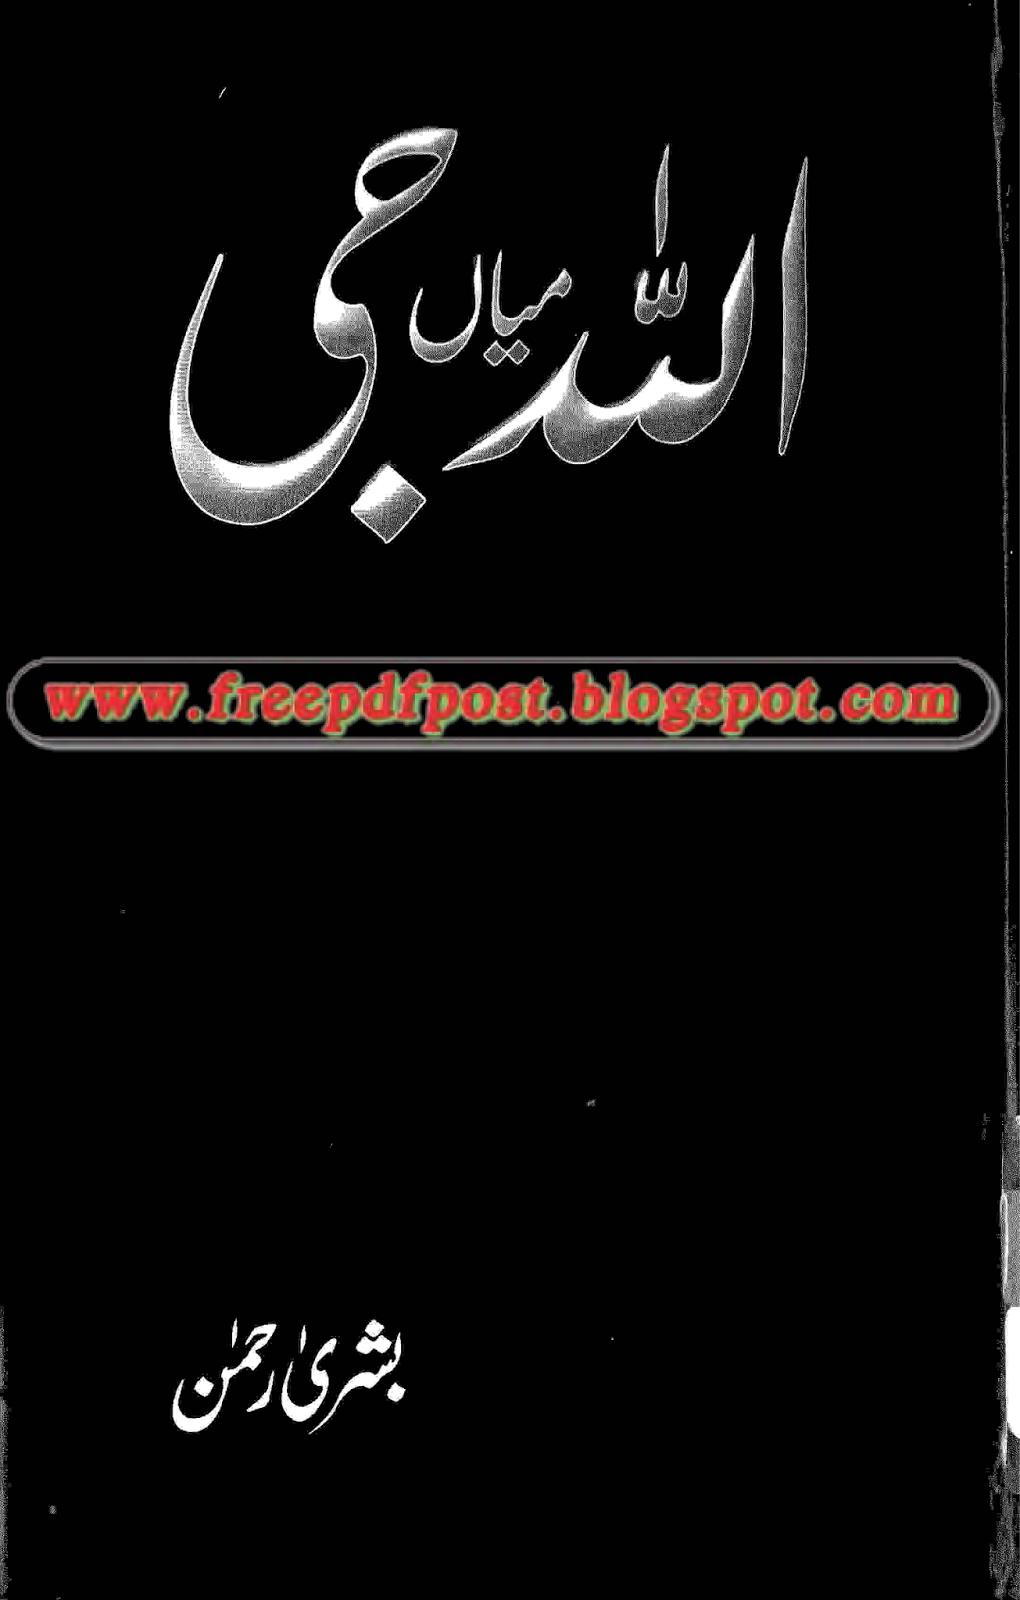 http://www10.zippyshare.com/v/Epnswjys/file.html